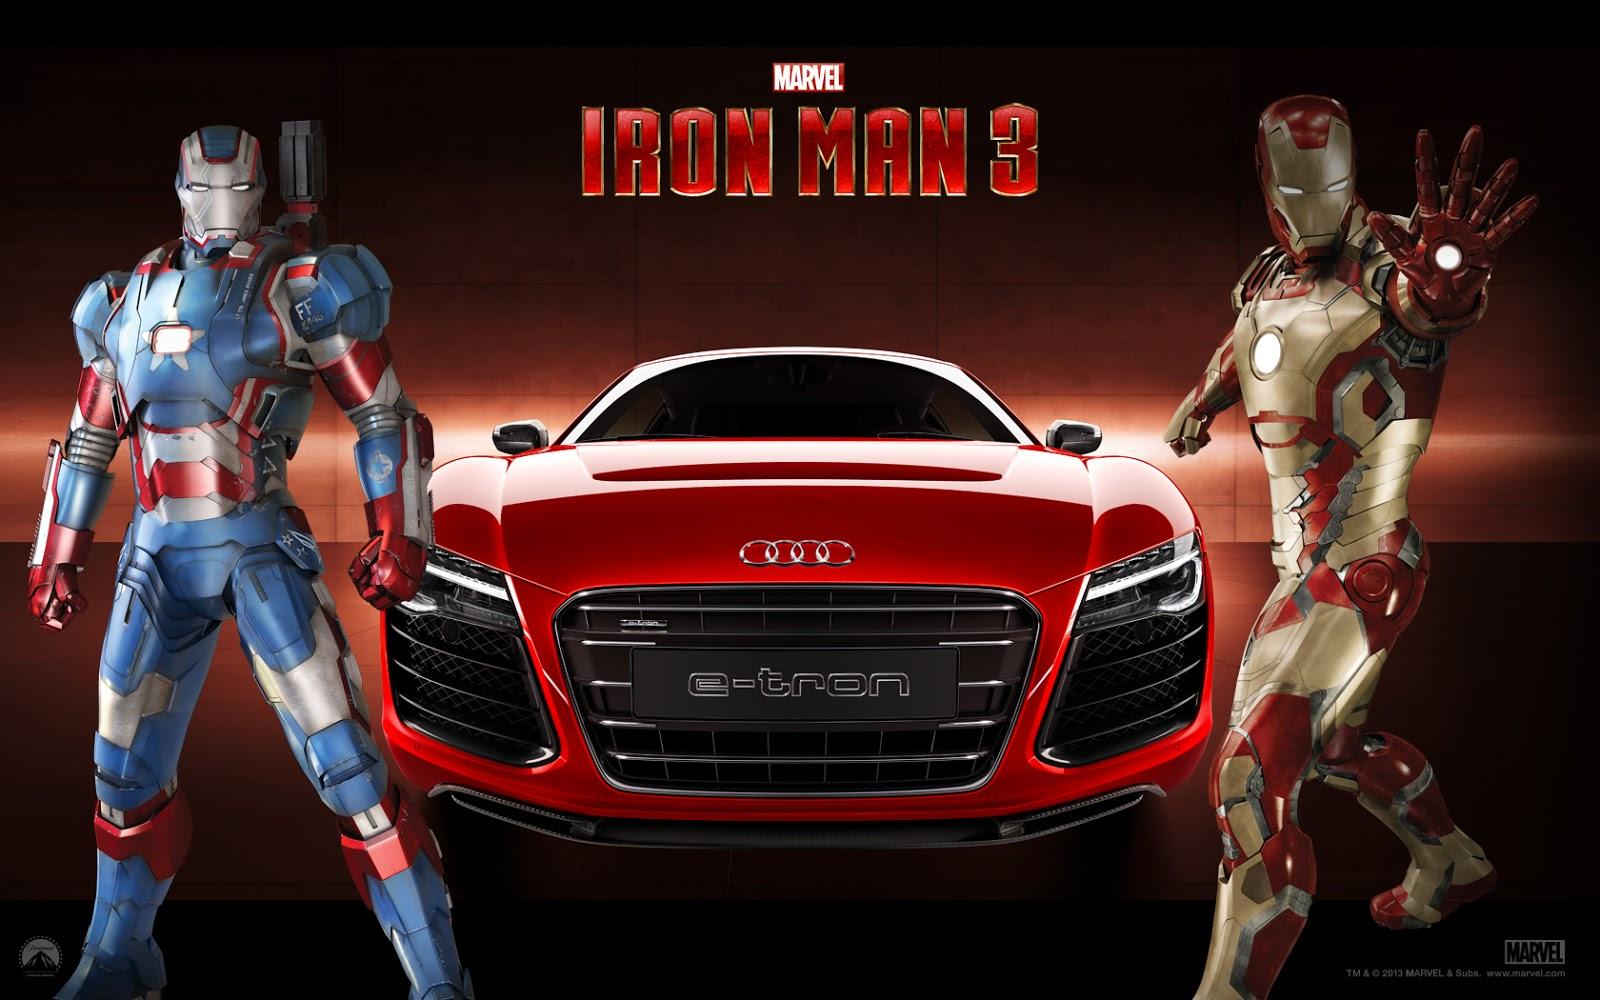 Iron Man 3 Pelicula Trailer